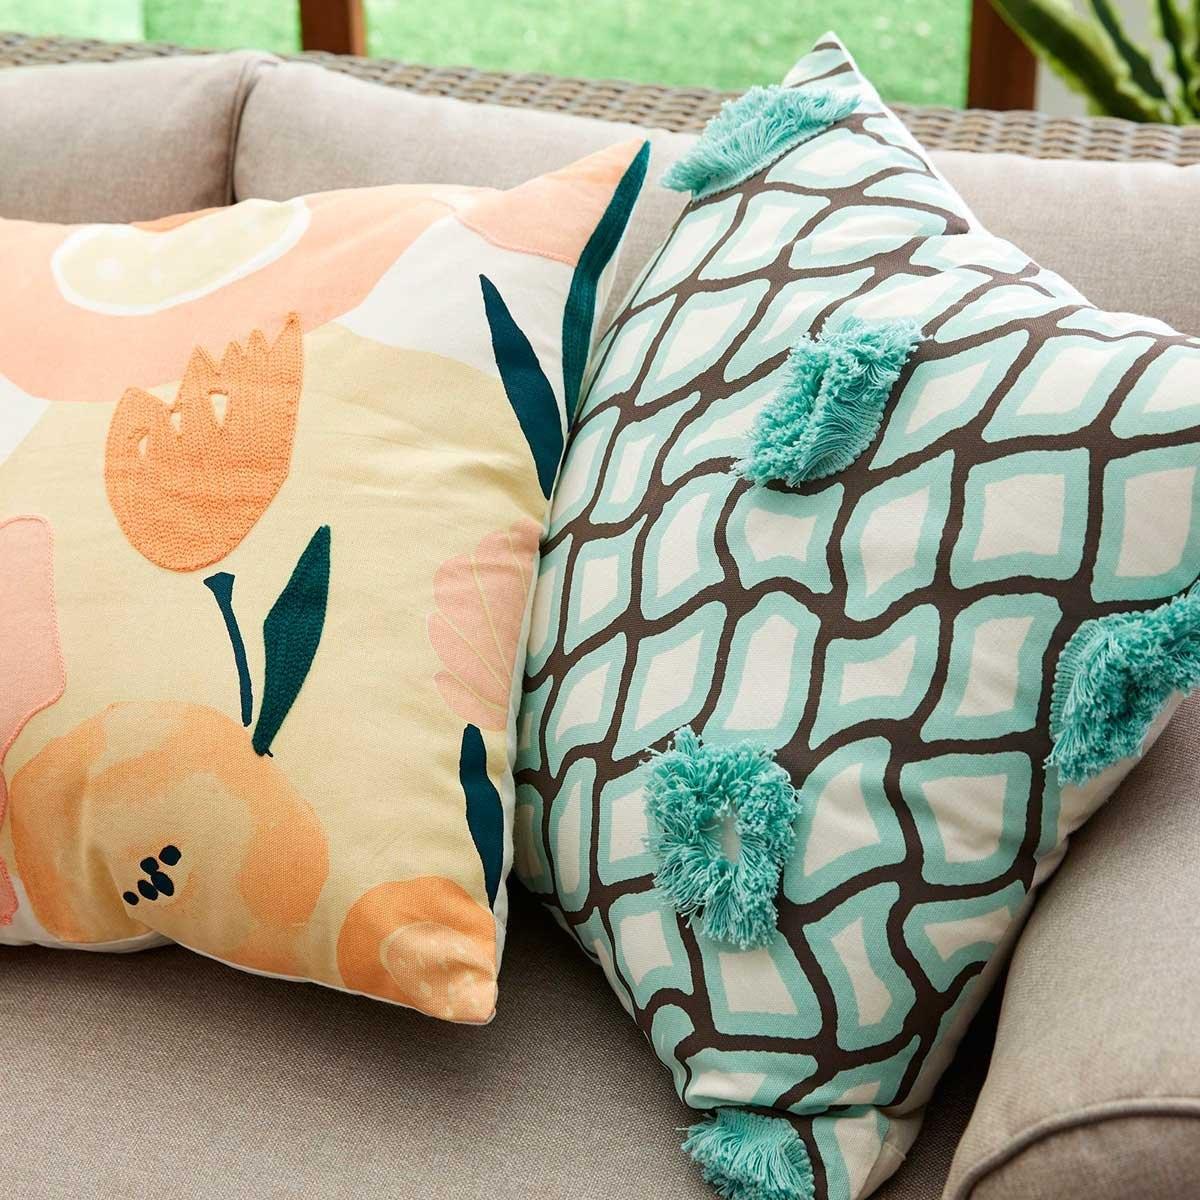 Cojín Embroidered Modern Floral Blush  Pier 1 Imports